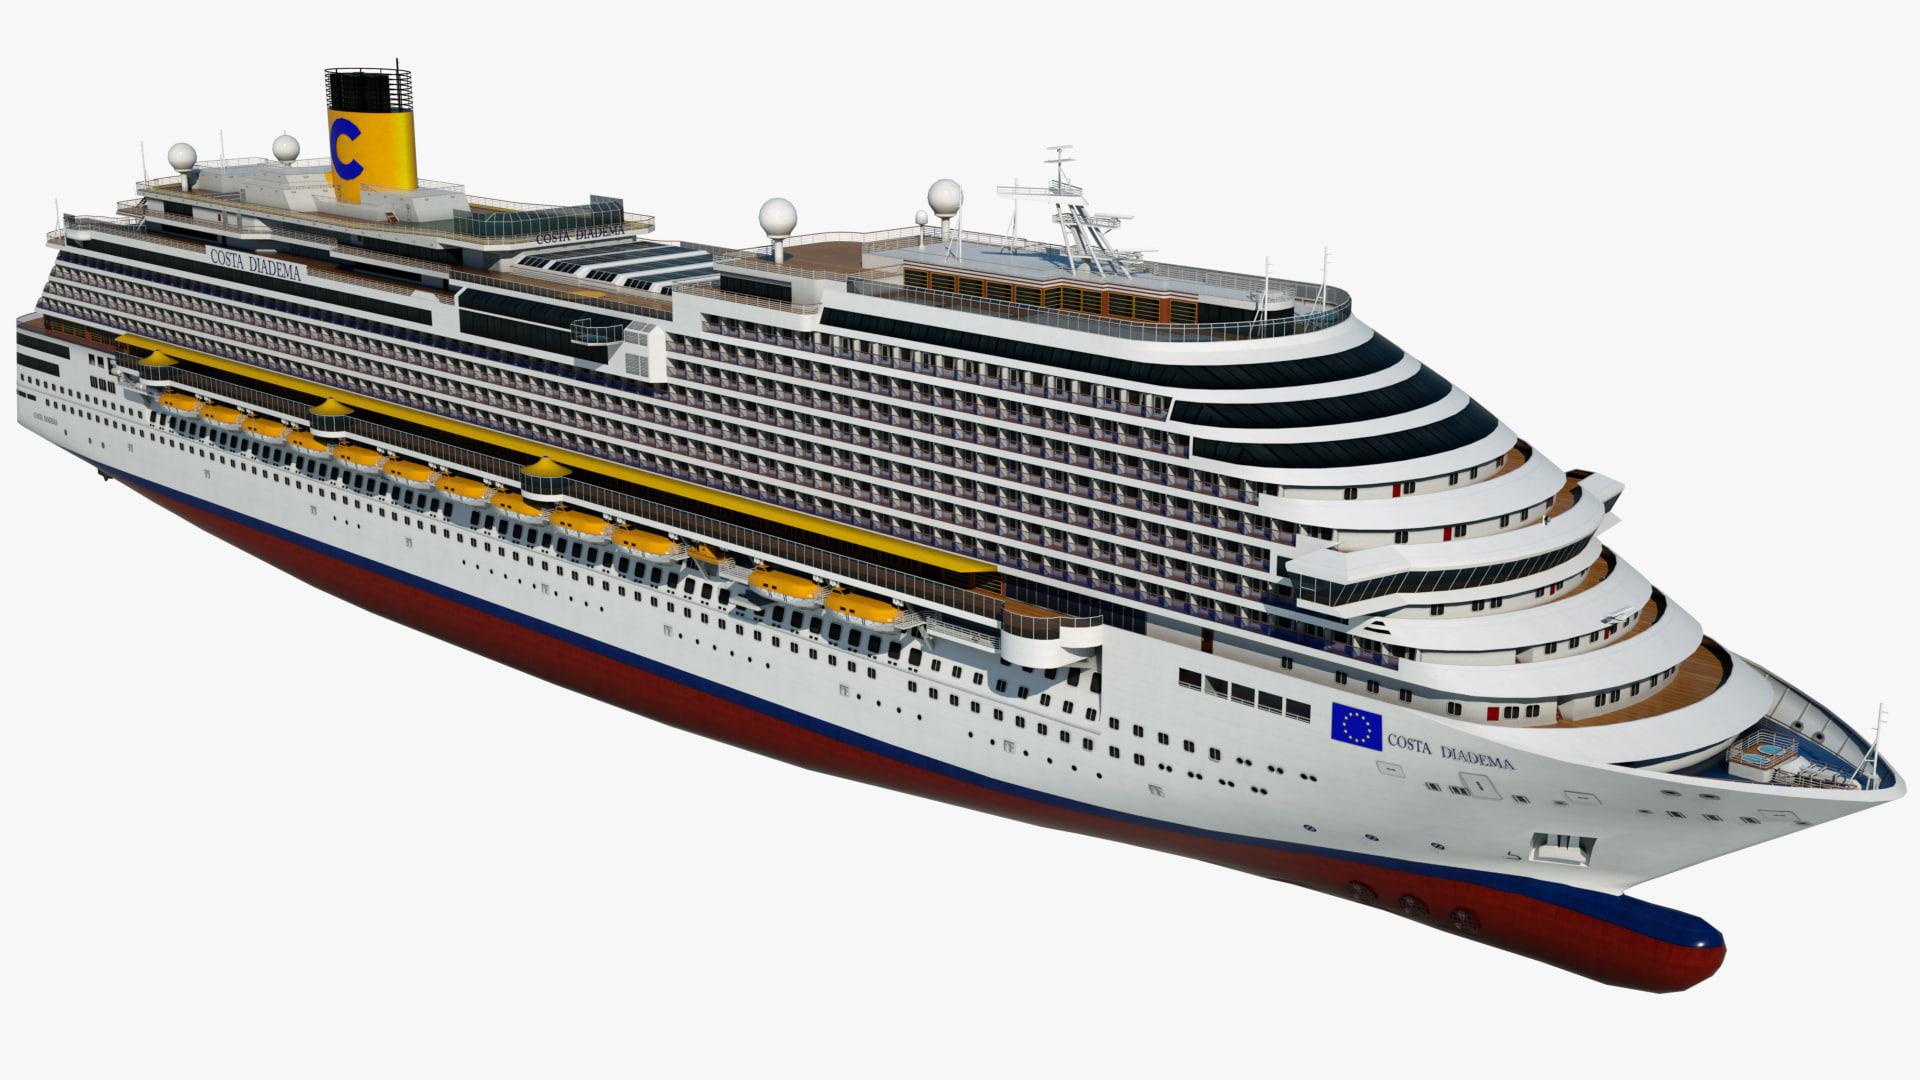 Cruise Ship Costa Diadema 3d Model 3dhunt Co